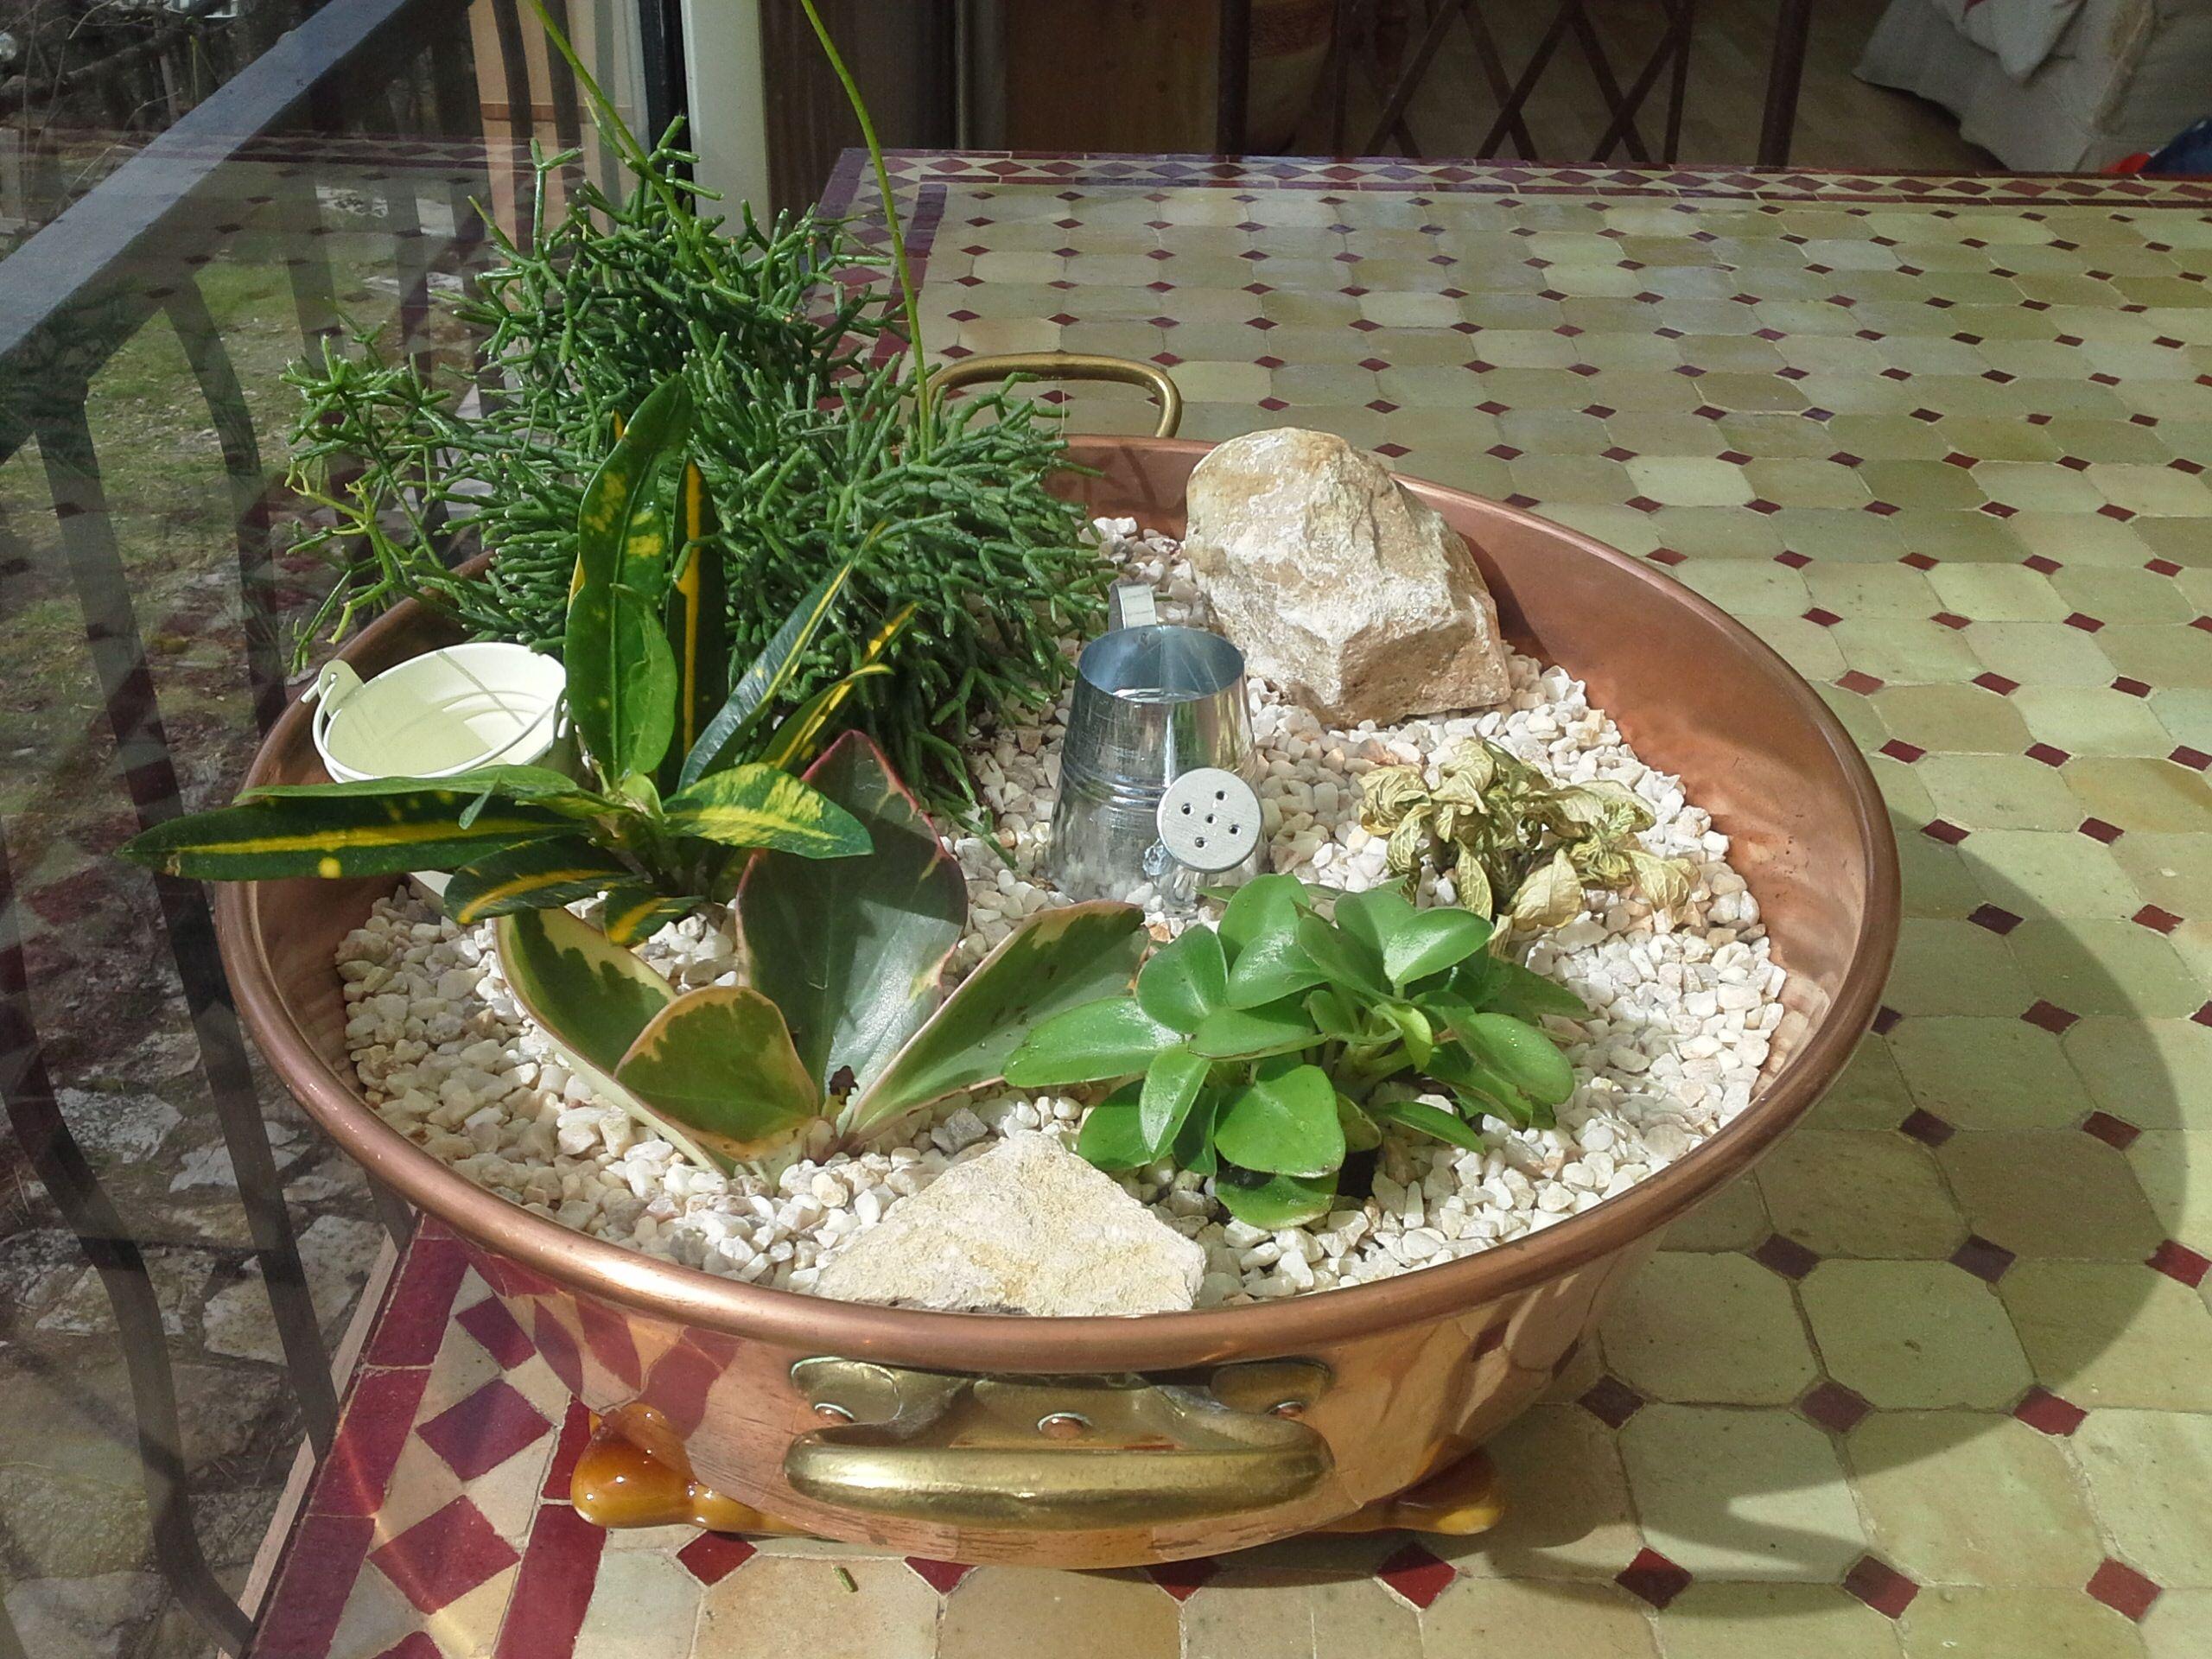 mini plantes grasses mini plante grasse plantes grasses photos pu59 jornalagora mini plante. Black Bedroom Furniture Sets. Home Design Ideas